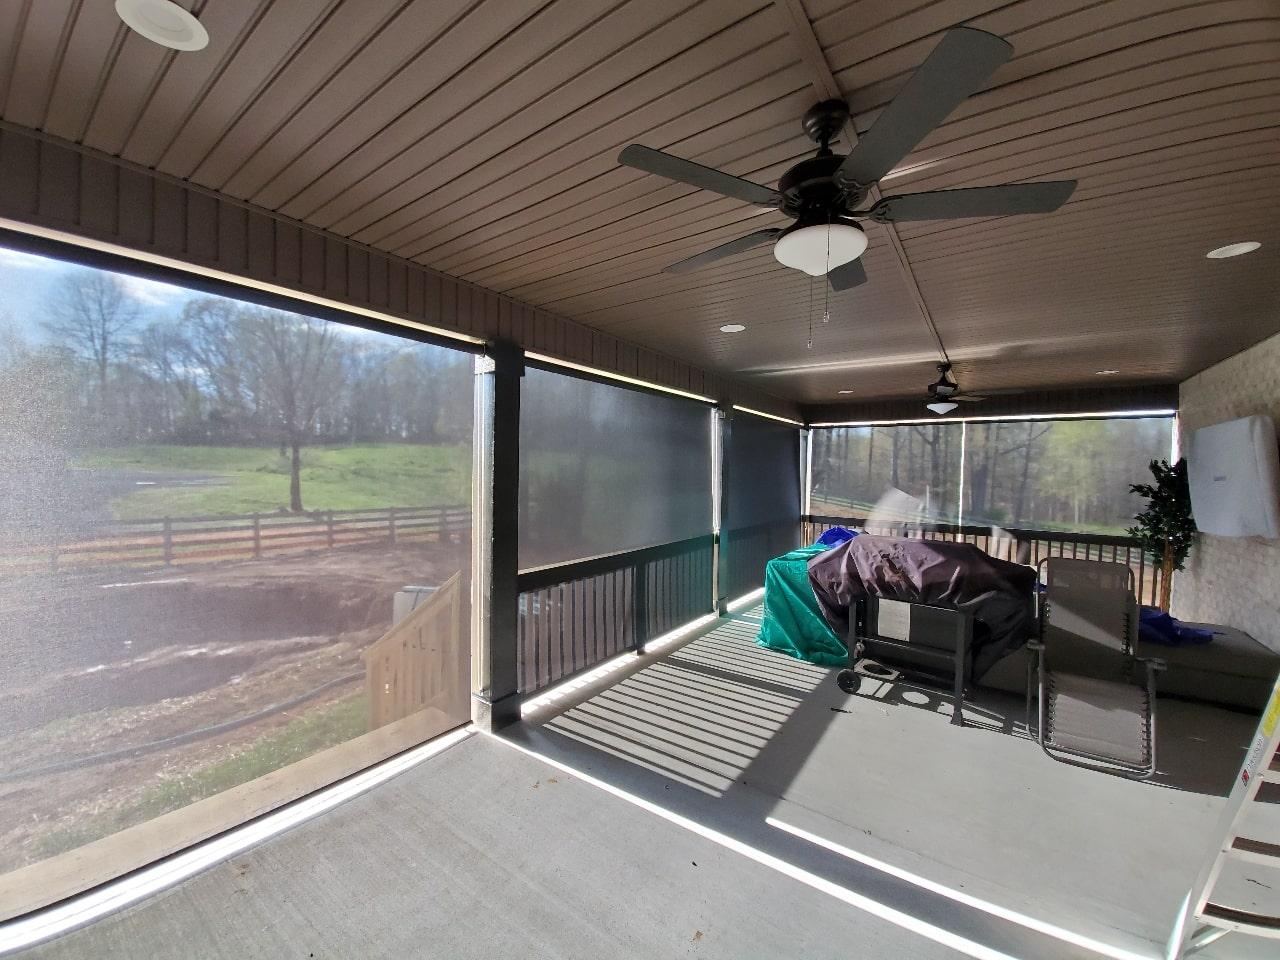 Window Shades from Patio - Interior Window Plantation Shutters - Custom, Motorized Window Treatments, Blind Repair, Custom Blinds | Nashville, TN